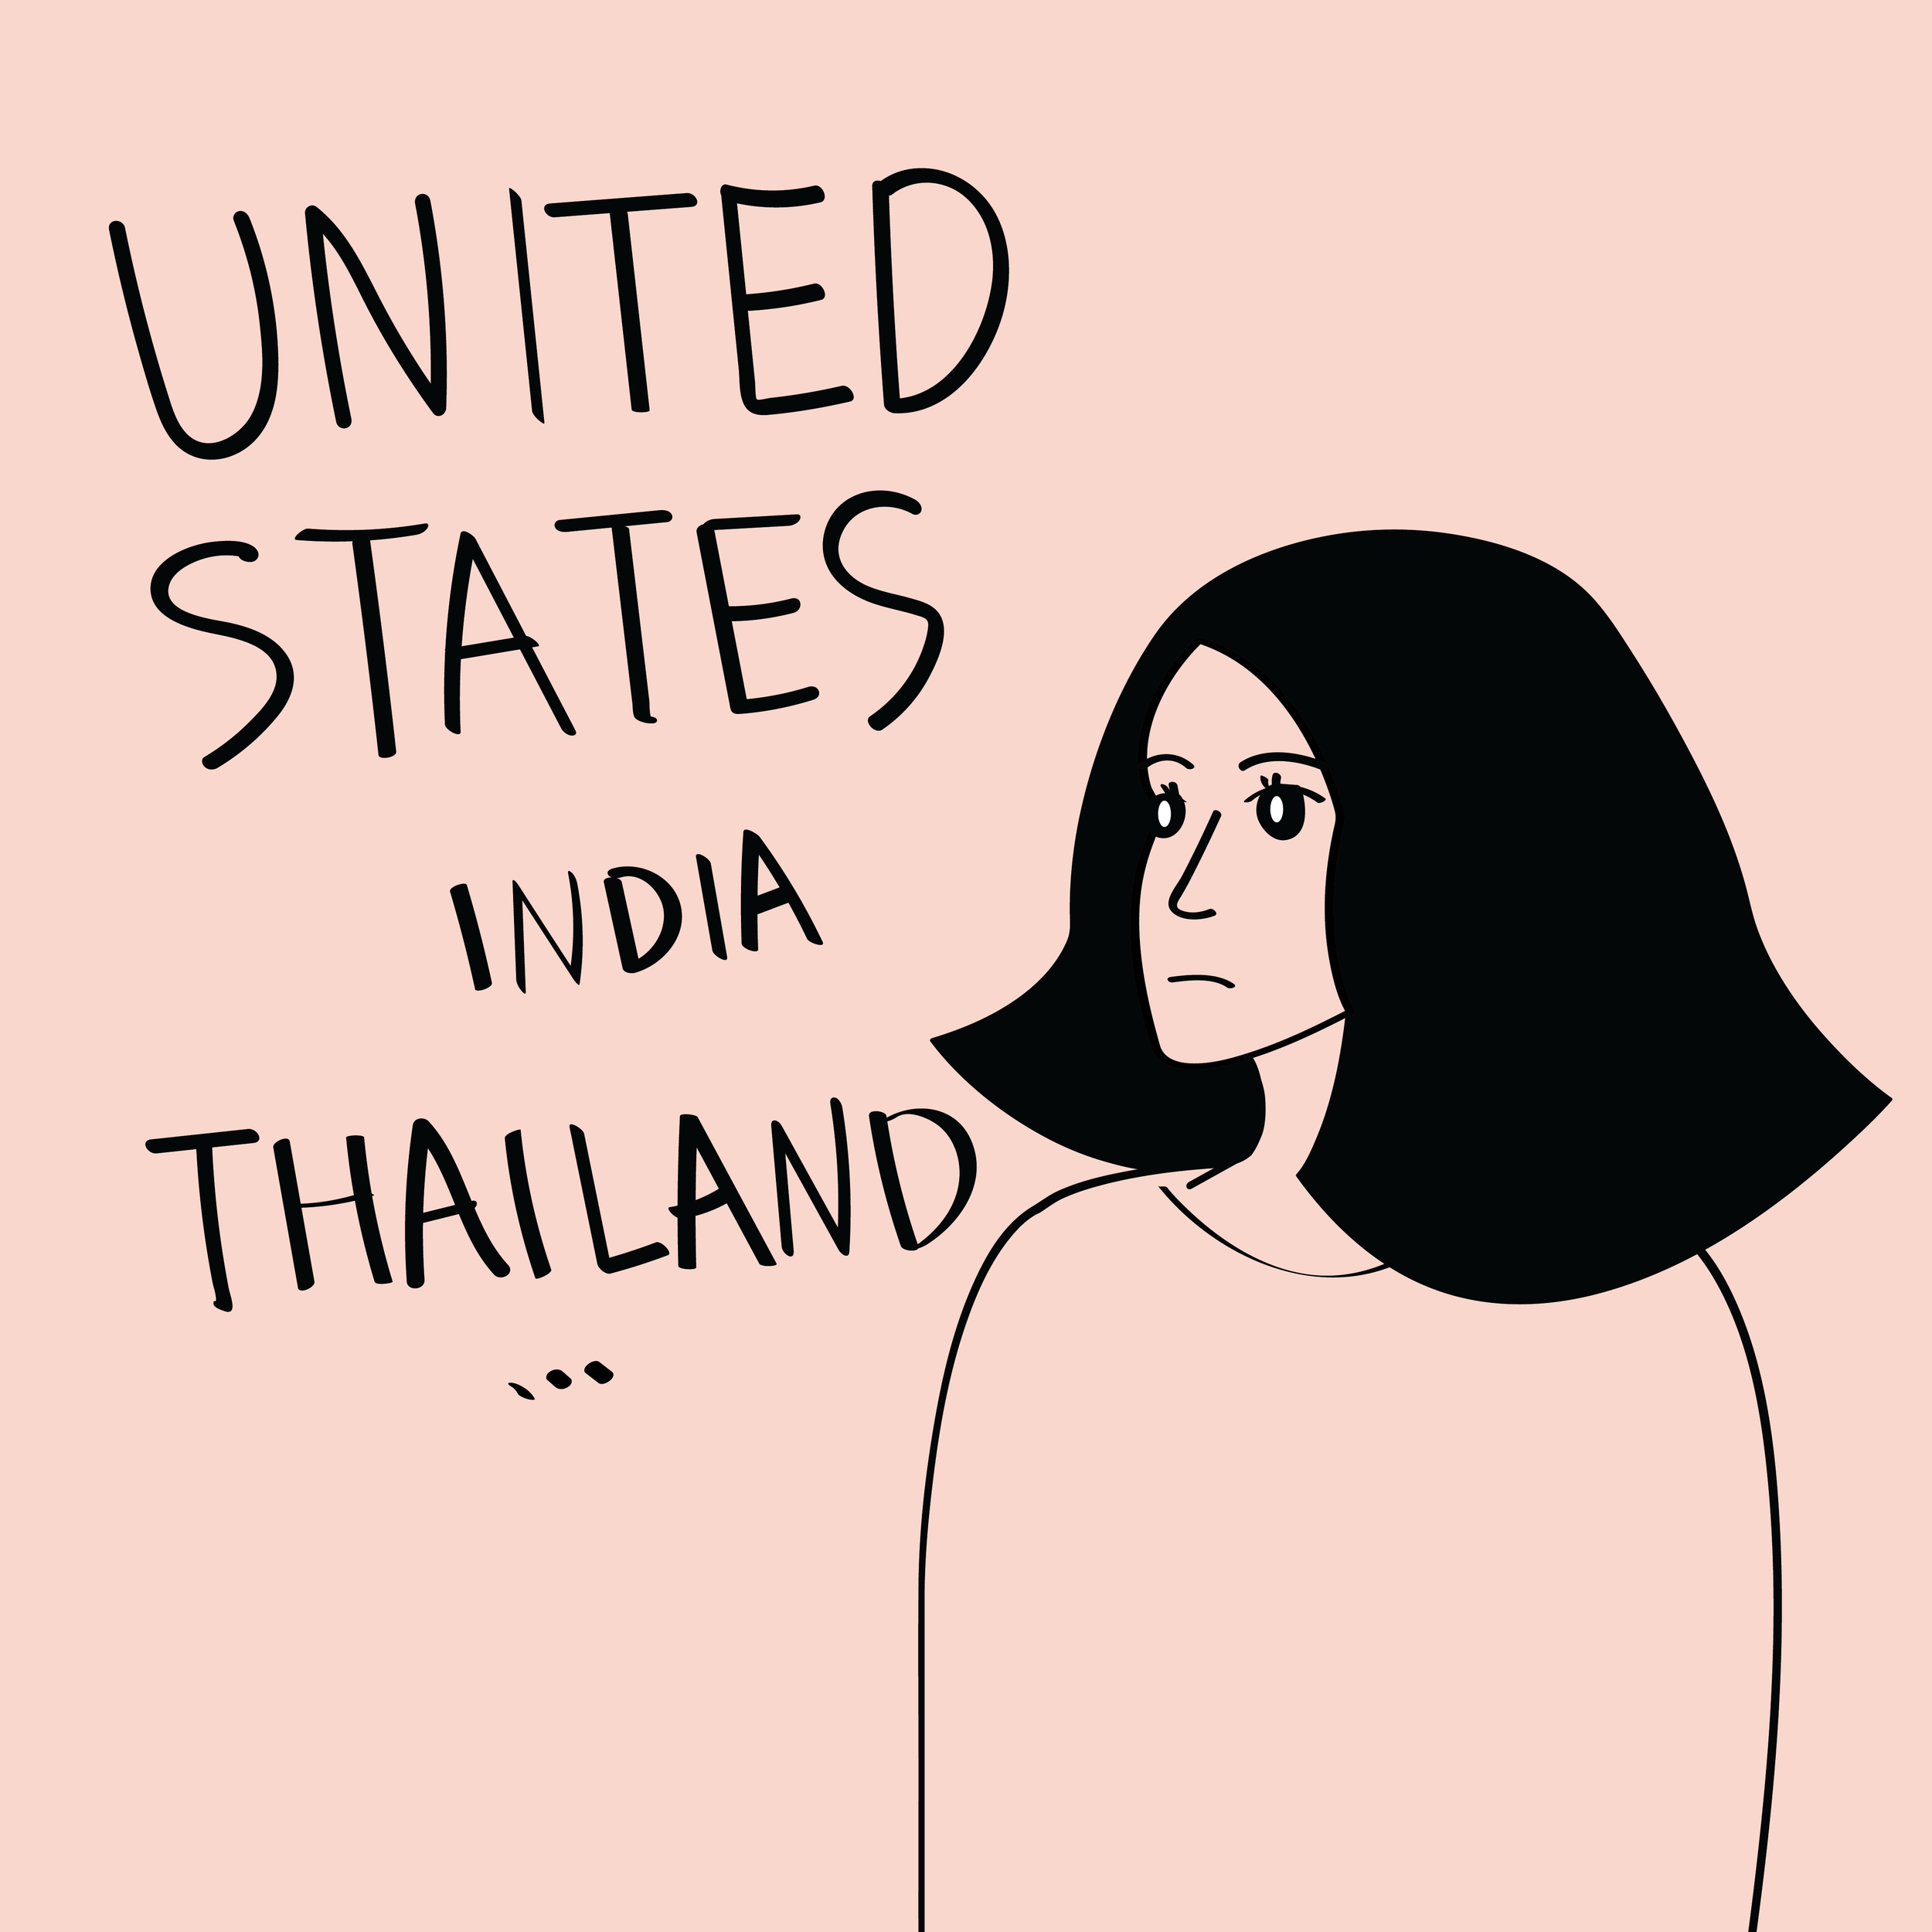 Illustration by Junyu Guan.